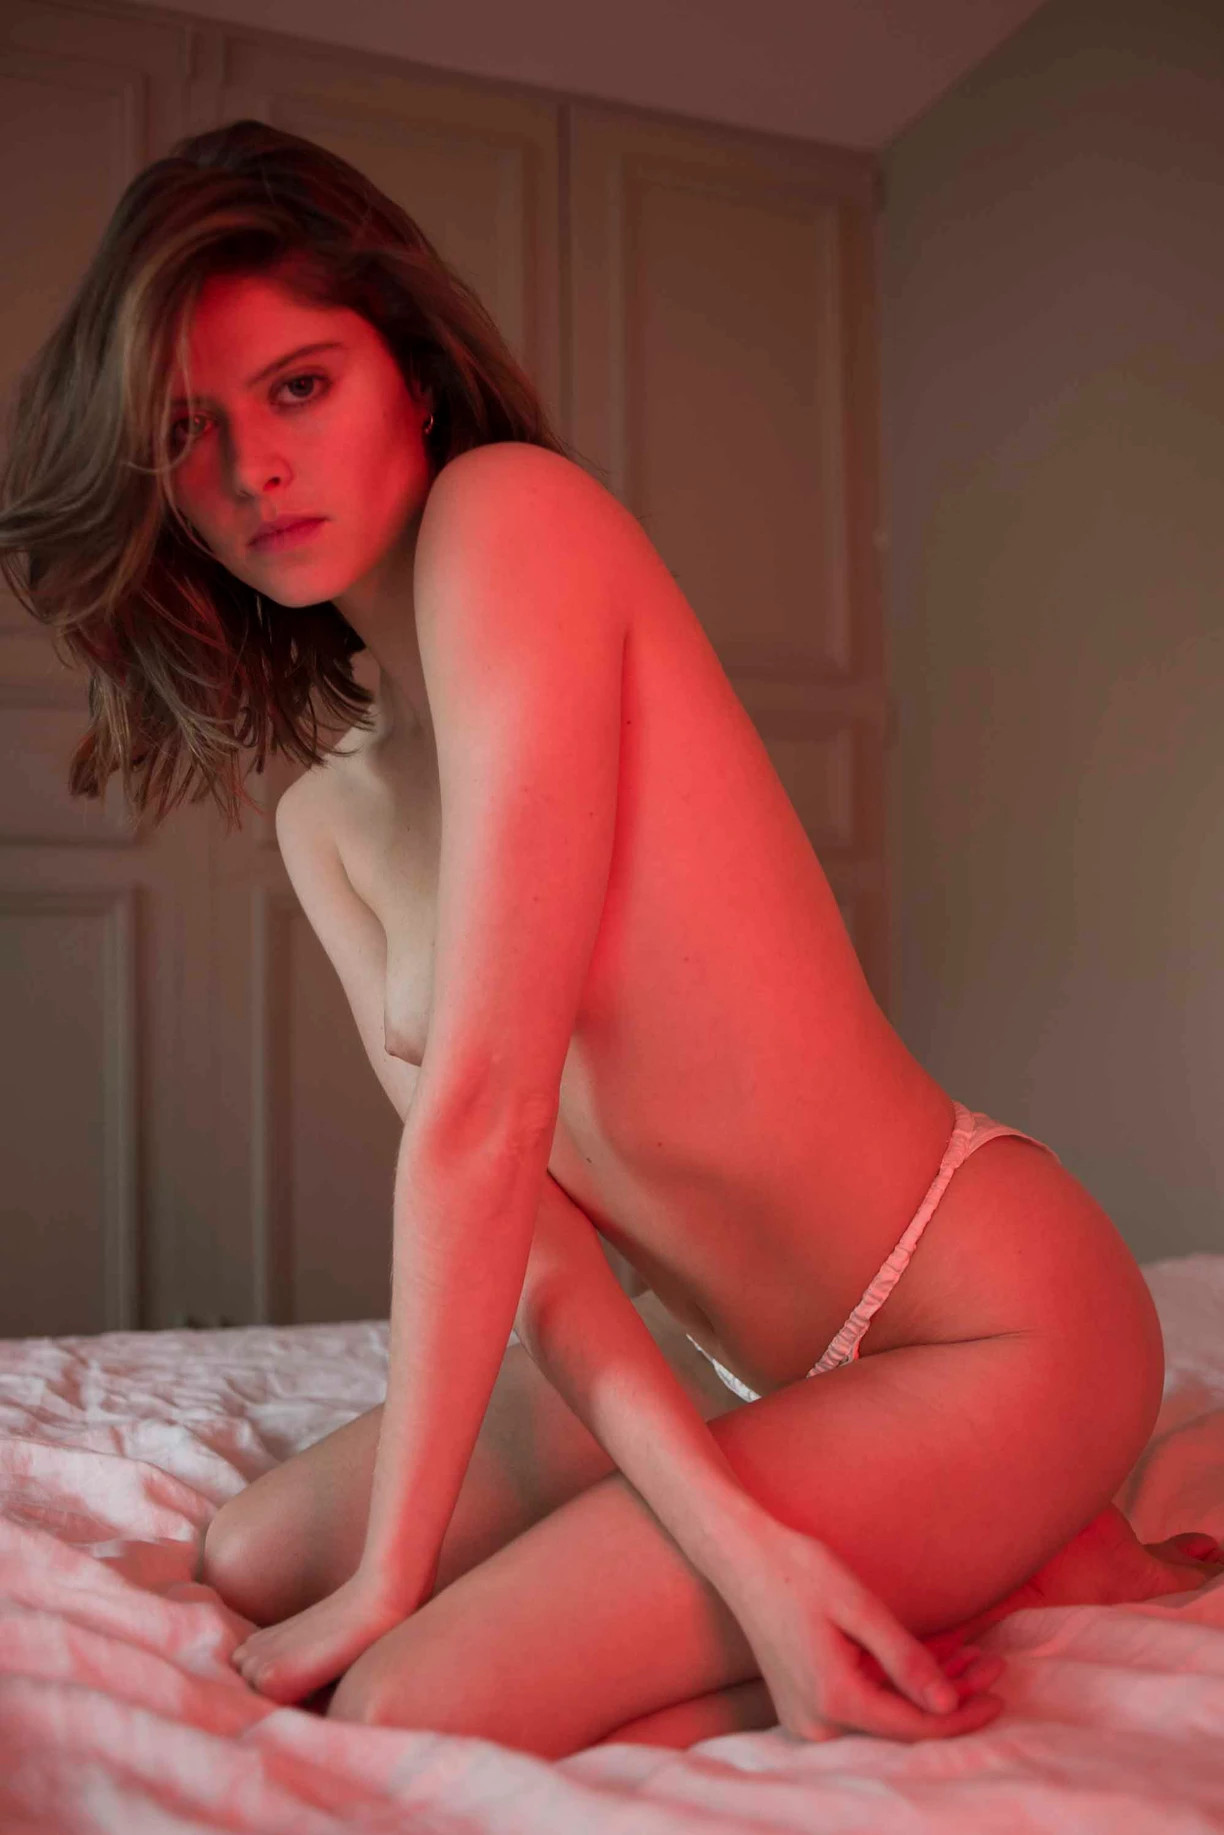 Gabriela Spader - Miguel Pena photoshoot